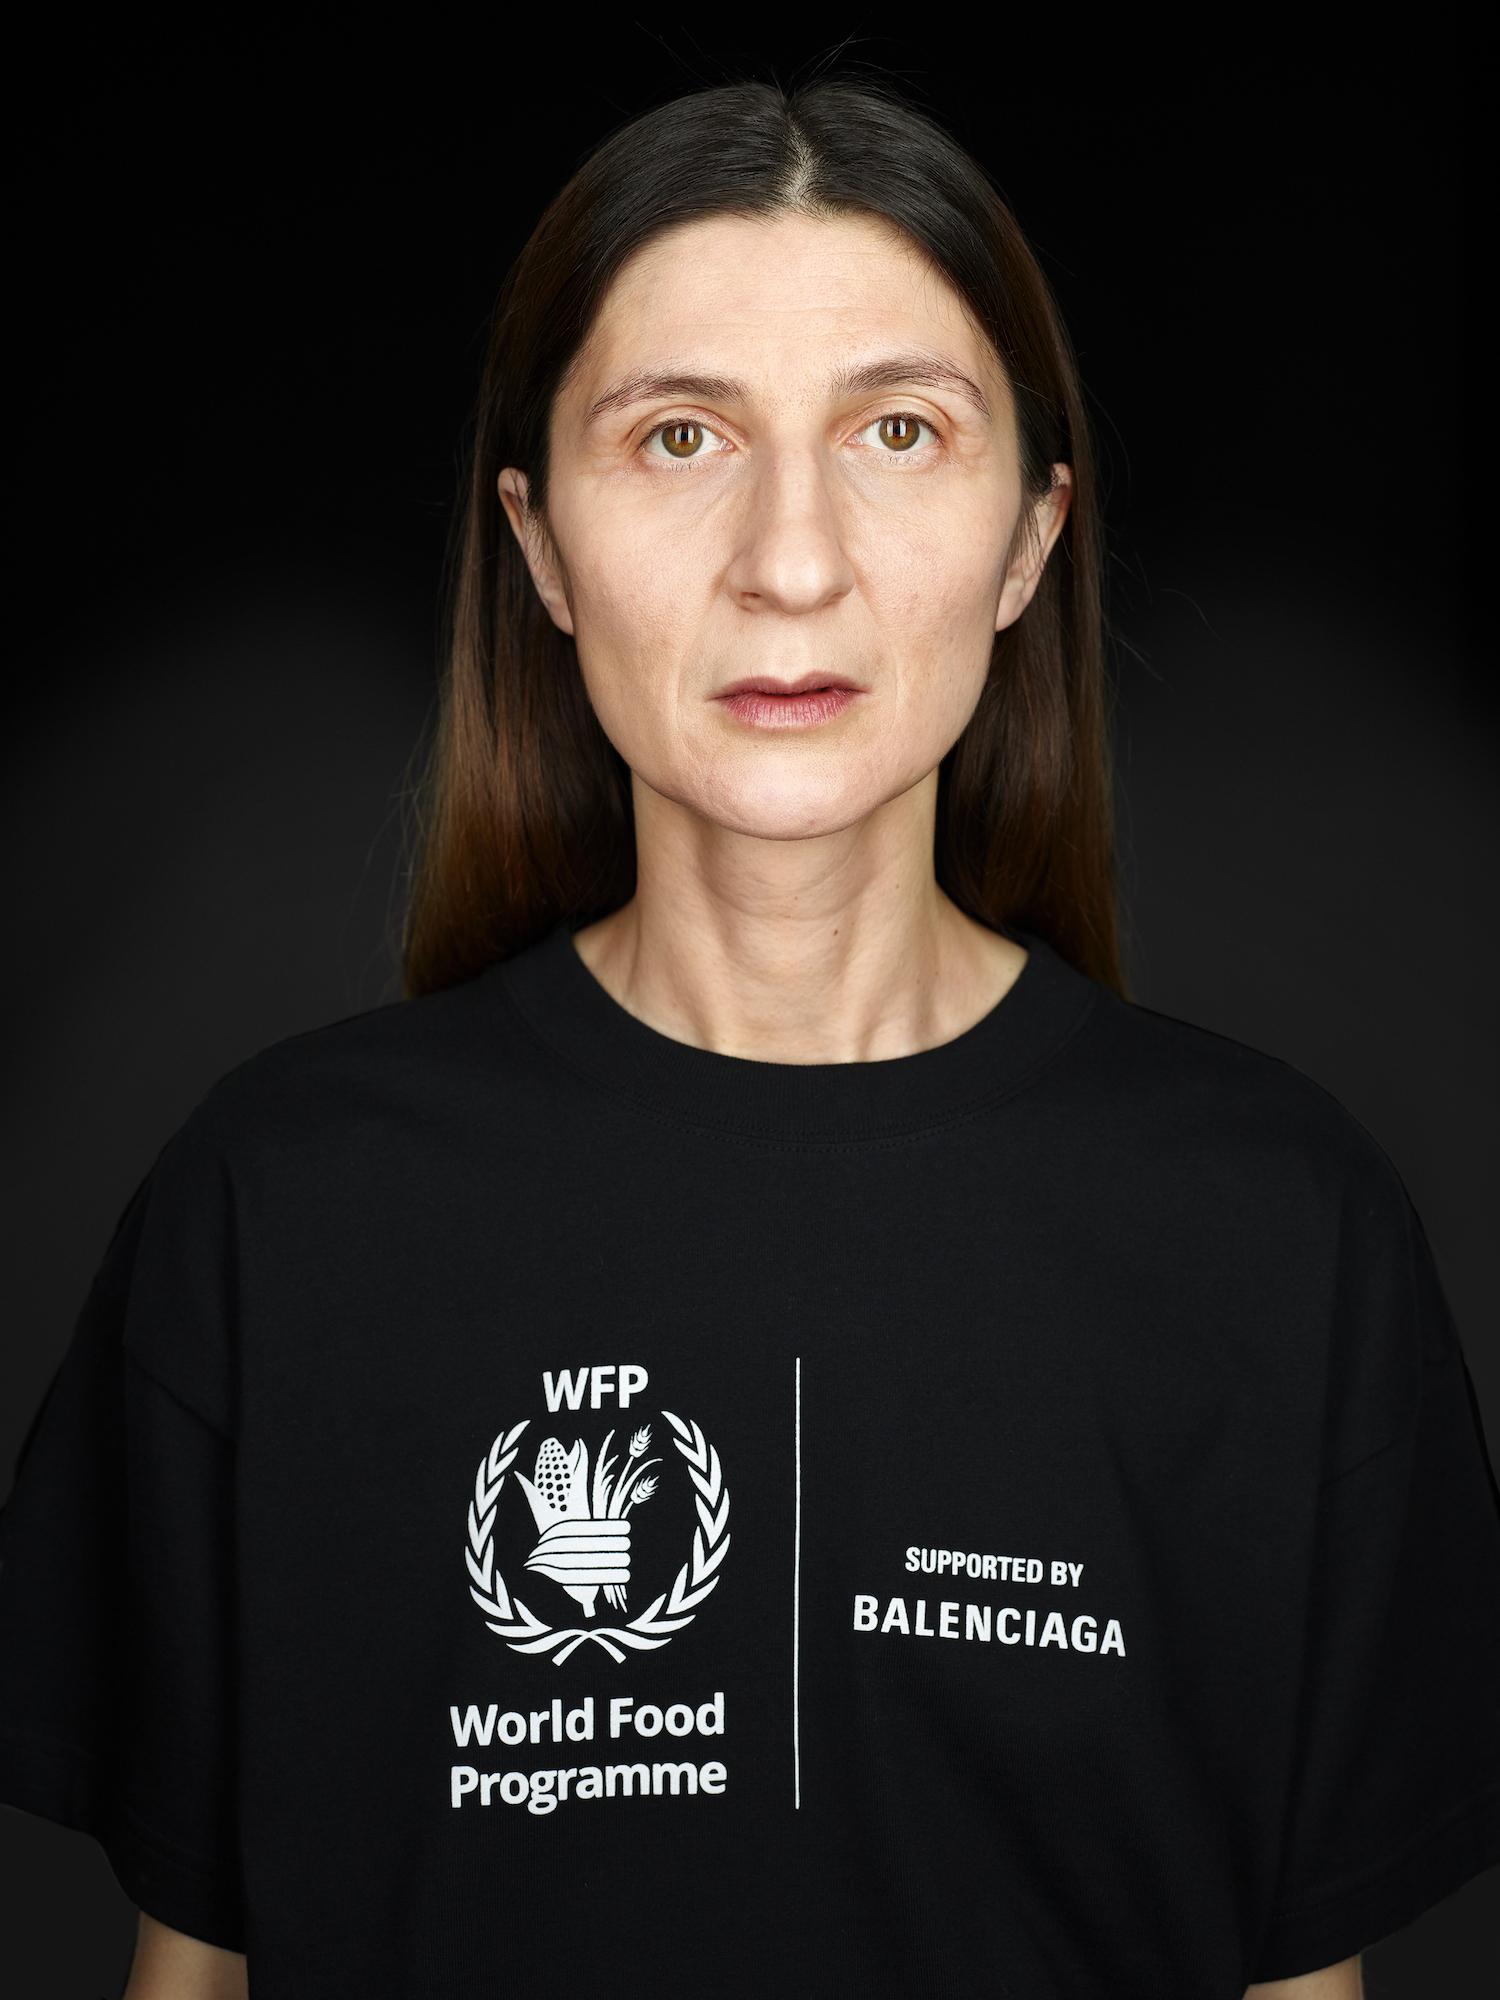 Balenciaga 以新系列继续支持世界粮食计划署